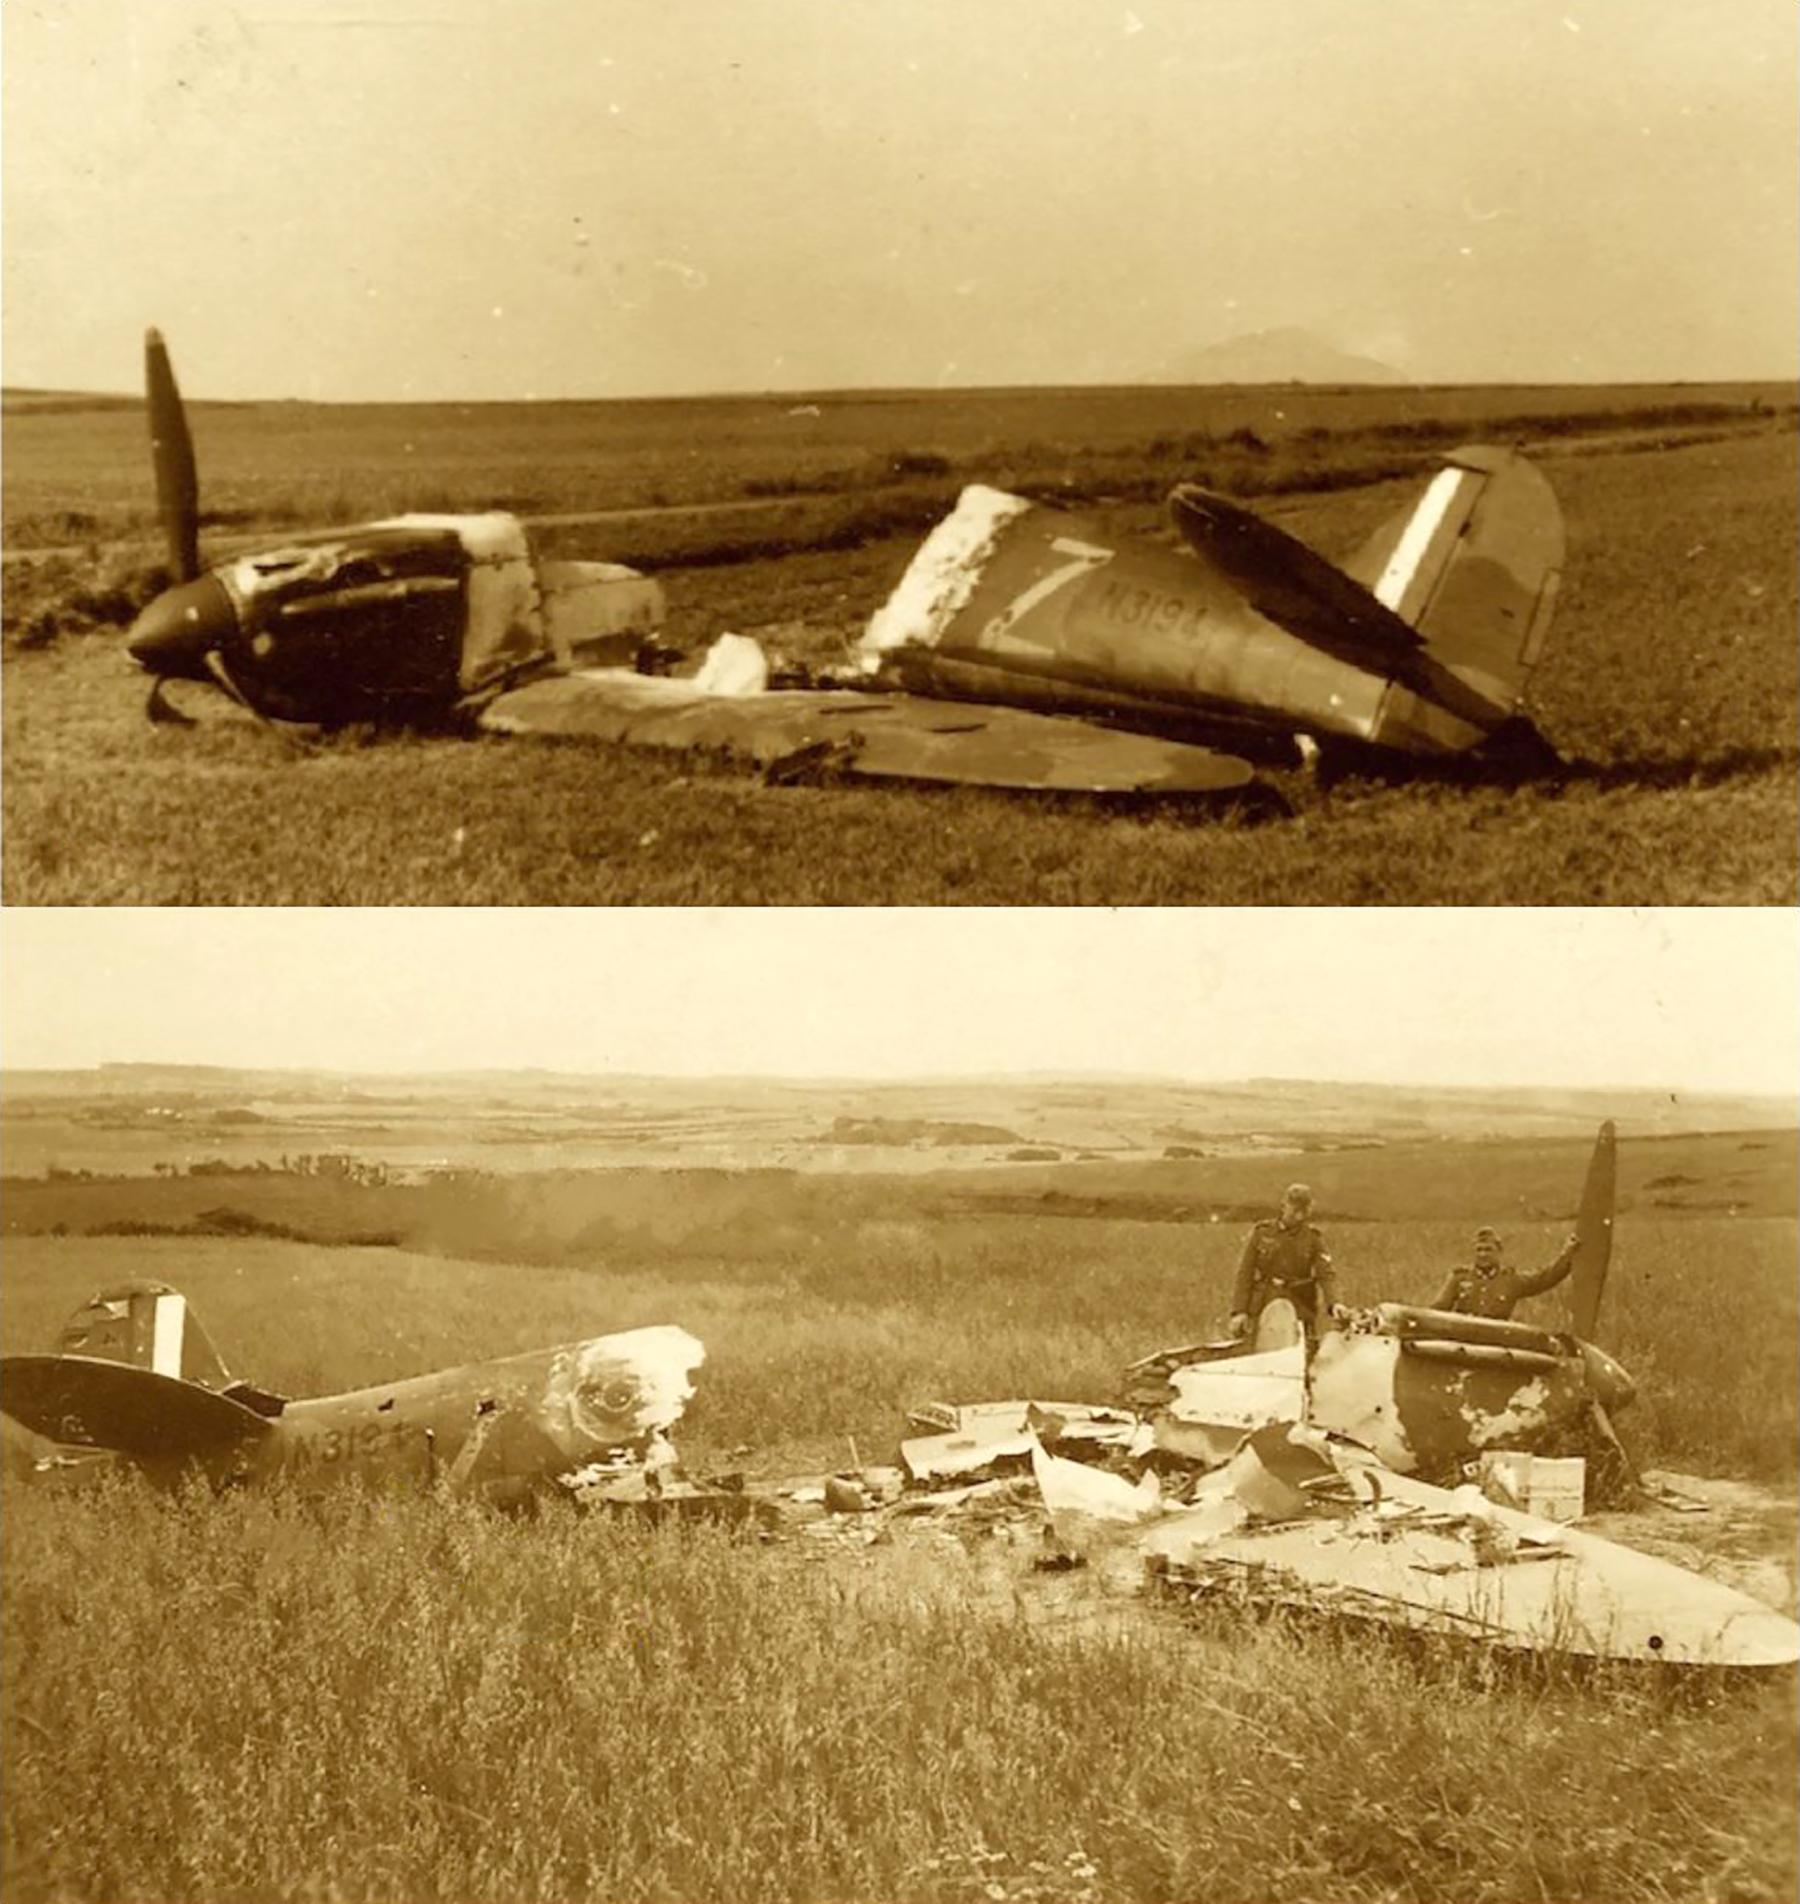 Spitfire MkIa RAF 92Sqn QJZ N3194 sd by Bf 109s near Calais 23rd May 1940 ebay2